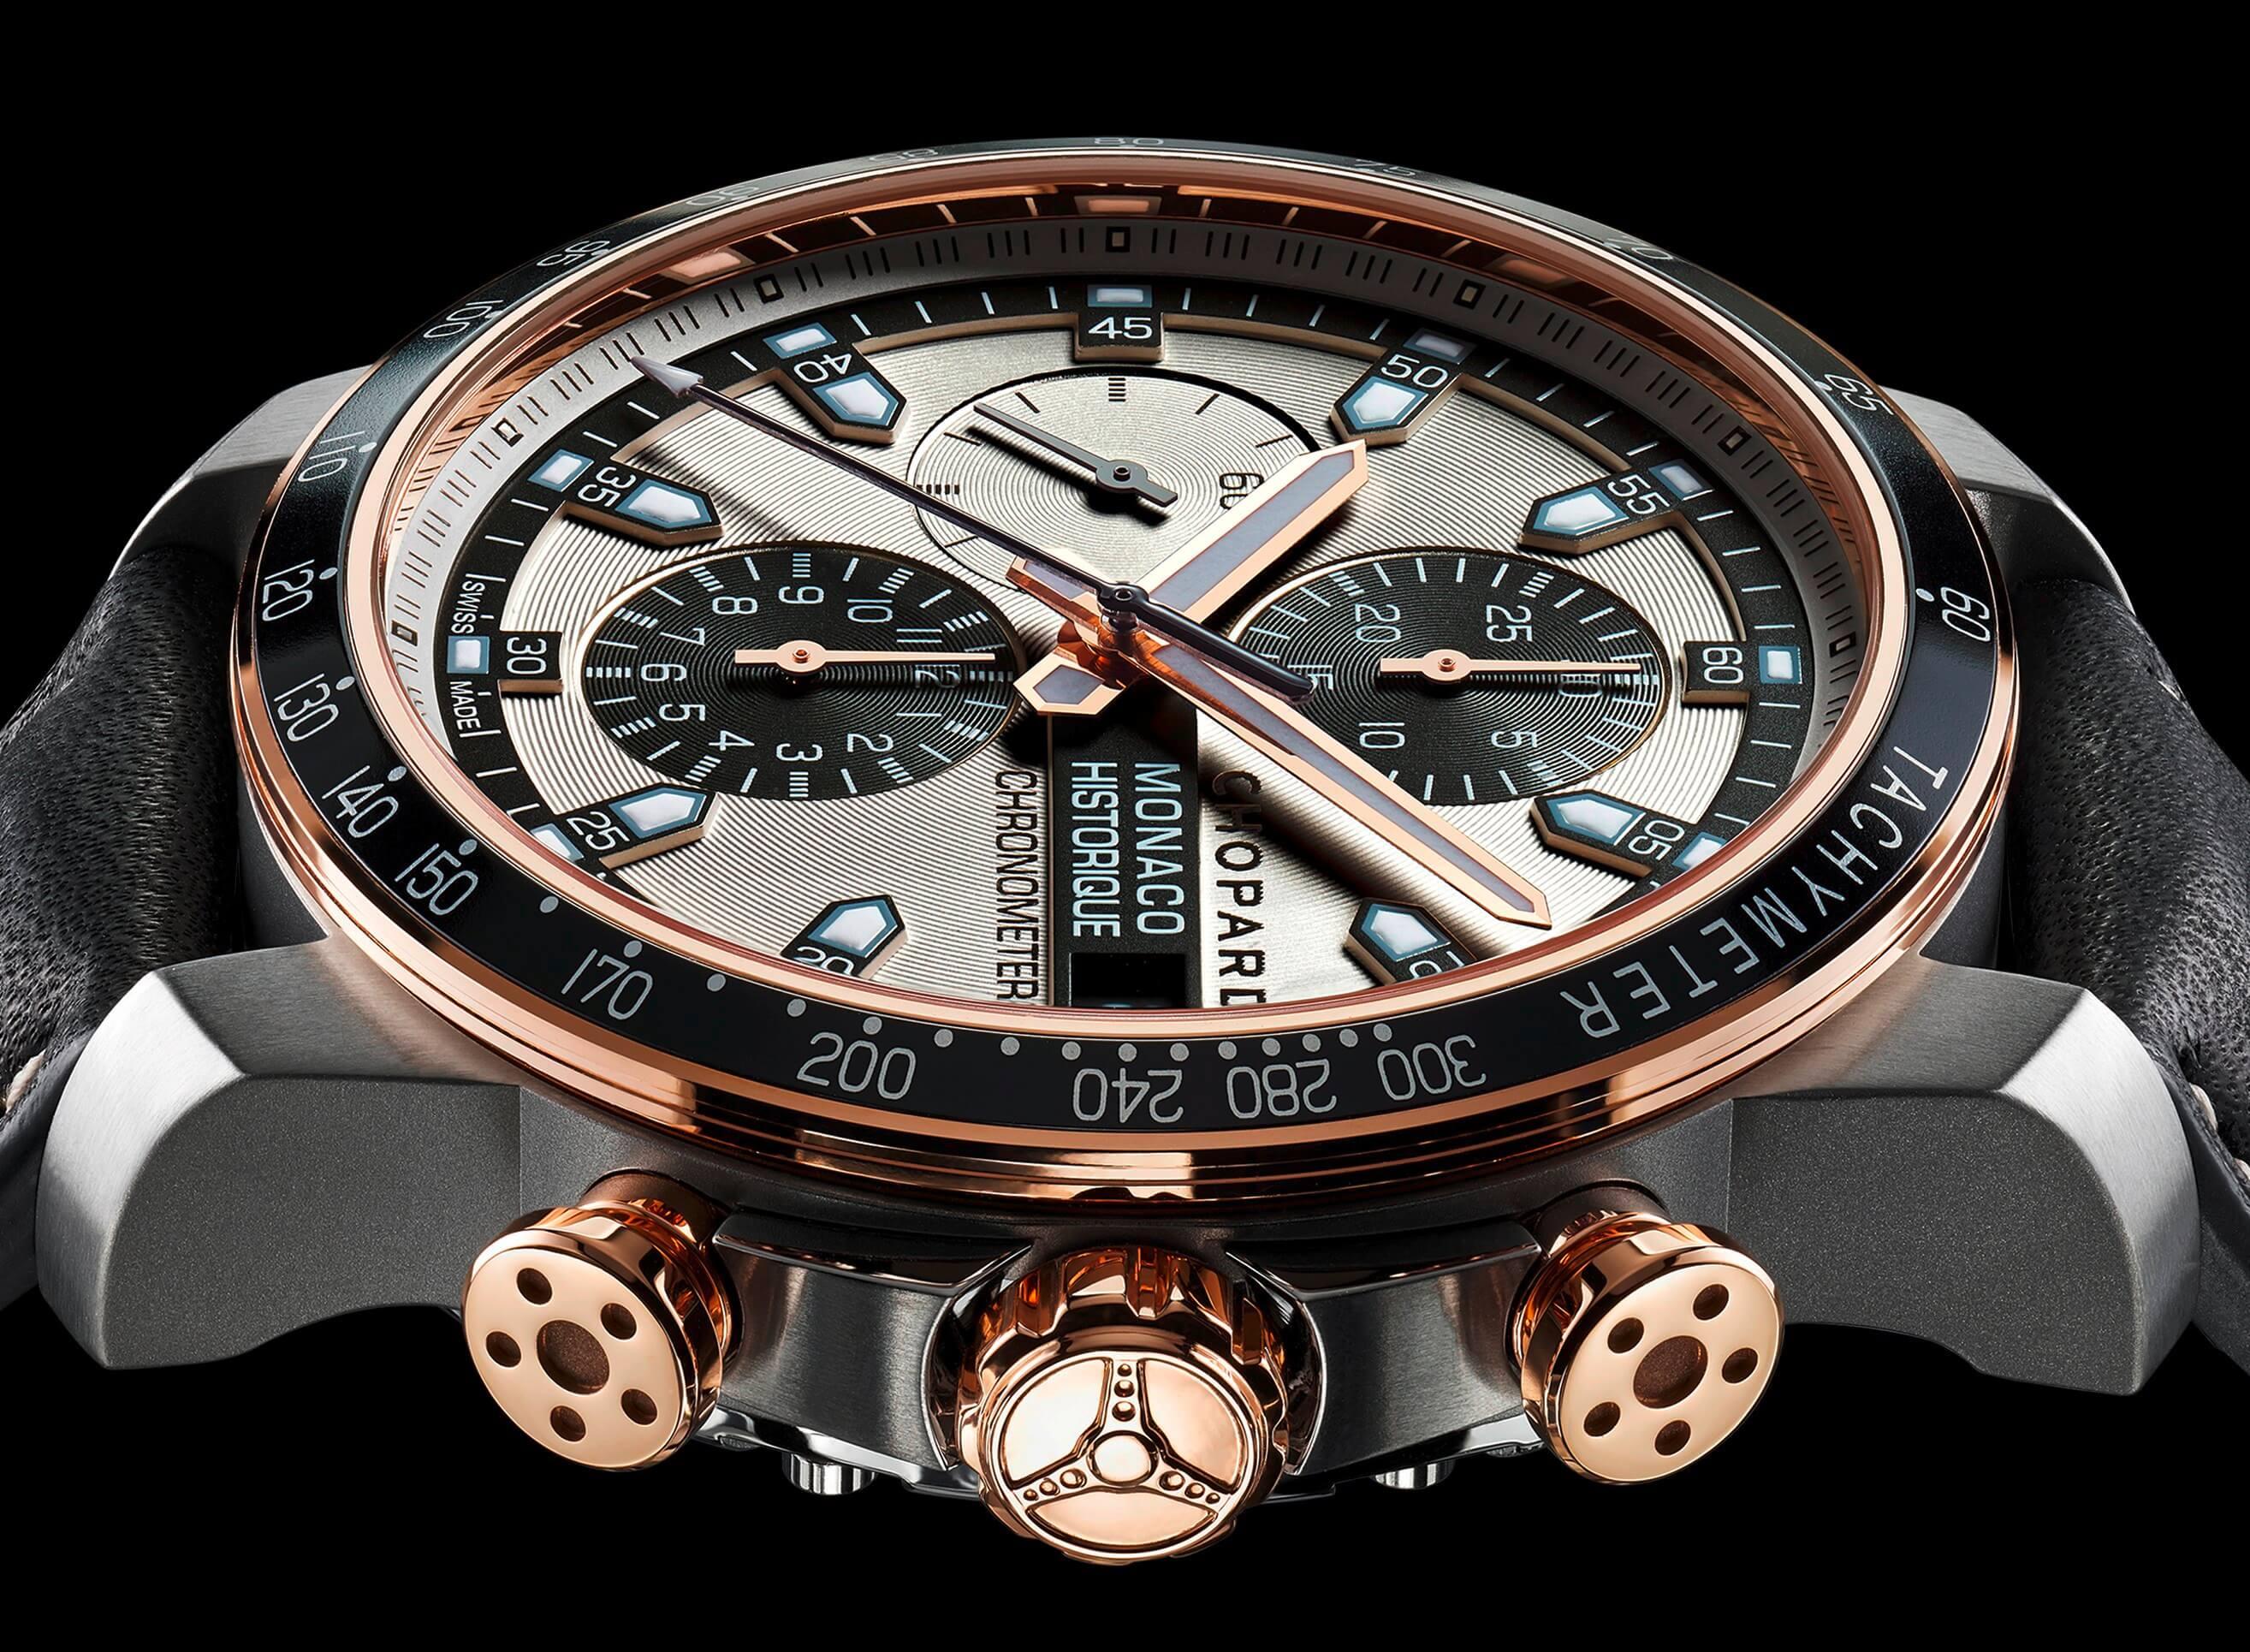 reloj-chopard-gpmh-chrono-side-black-background